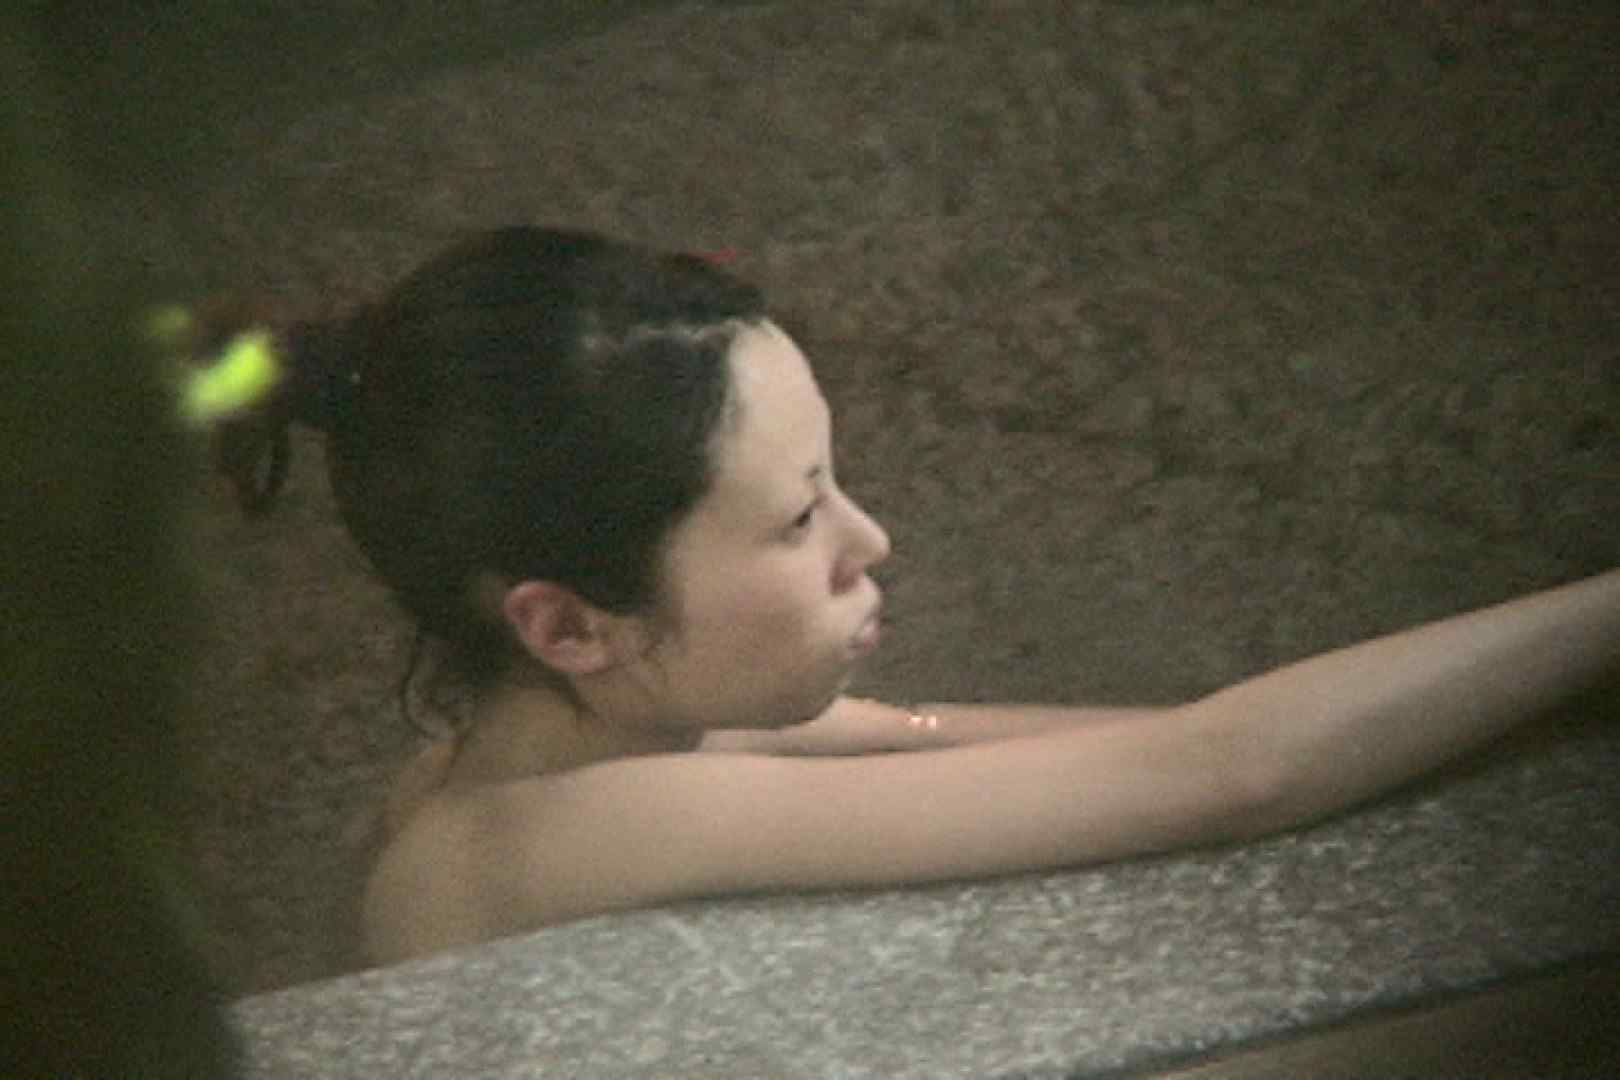 Aquaな露天風呂Vol.707 0 | 0  76連発 43